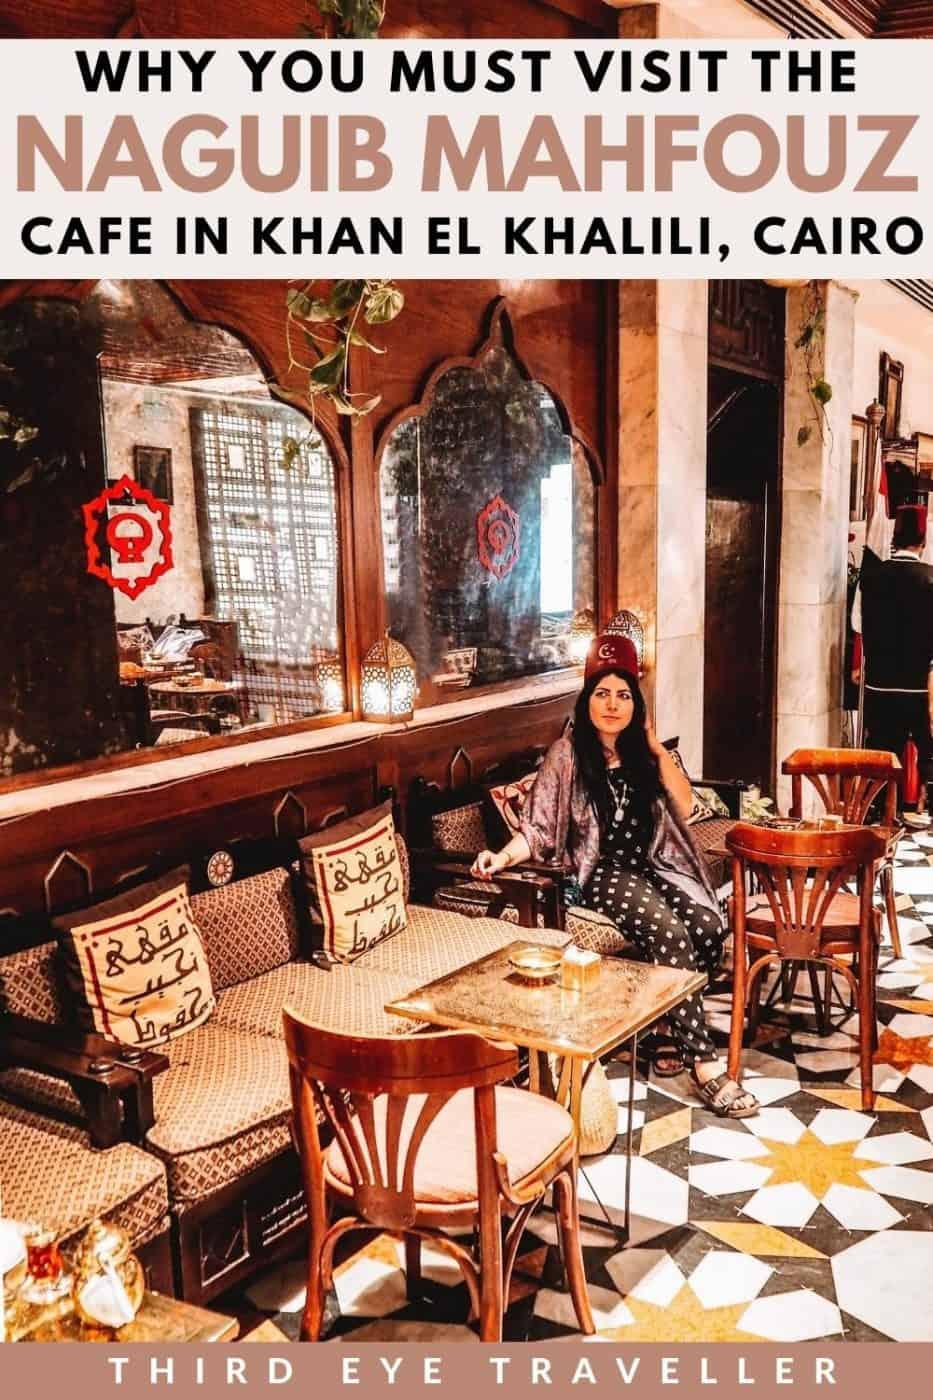 Naguib Mahfouz Cafe Cairo Khan el Khalili Restaurant